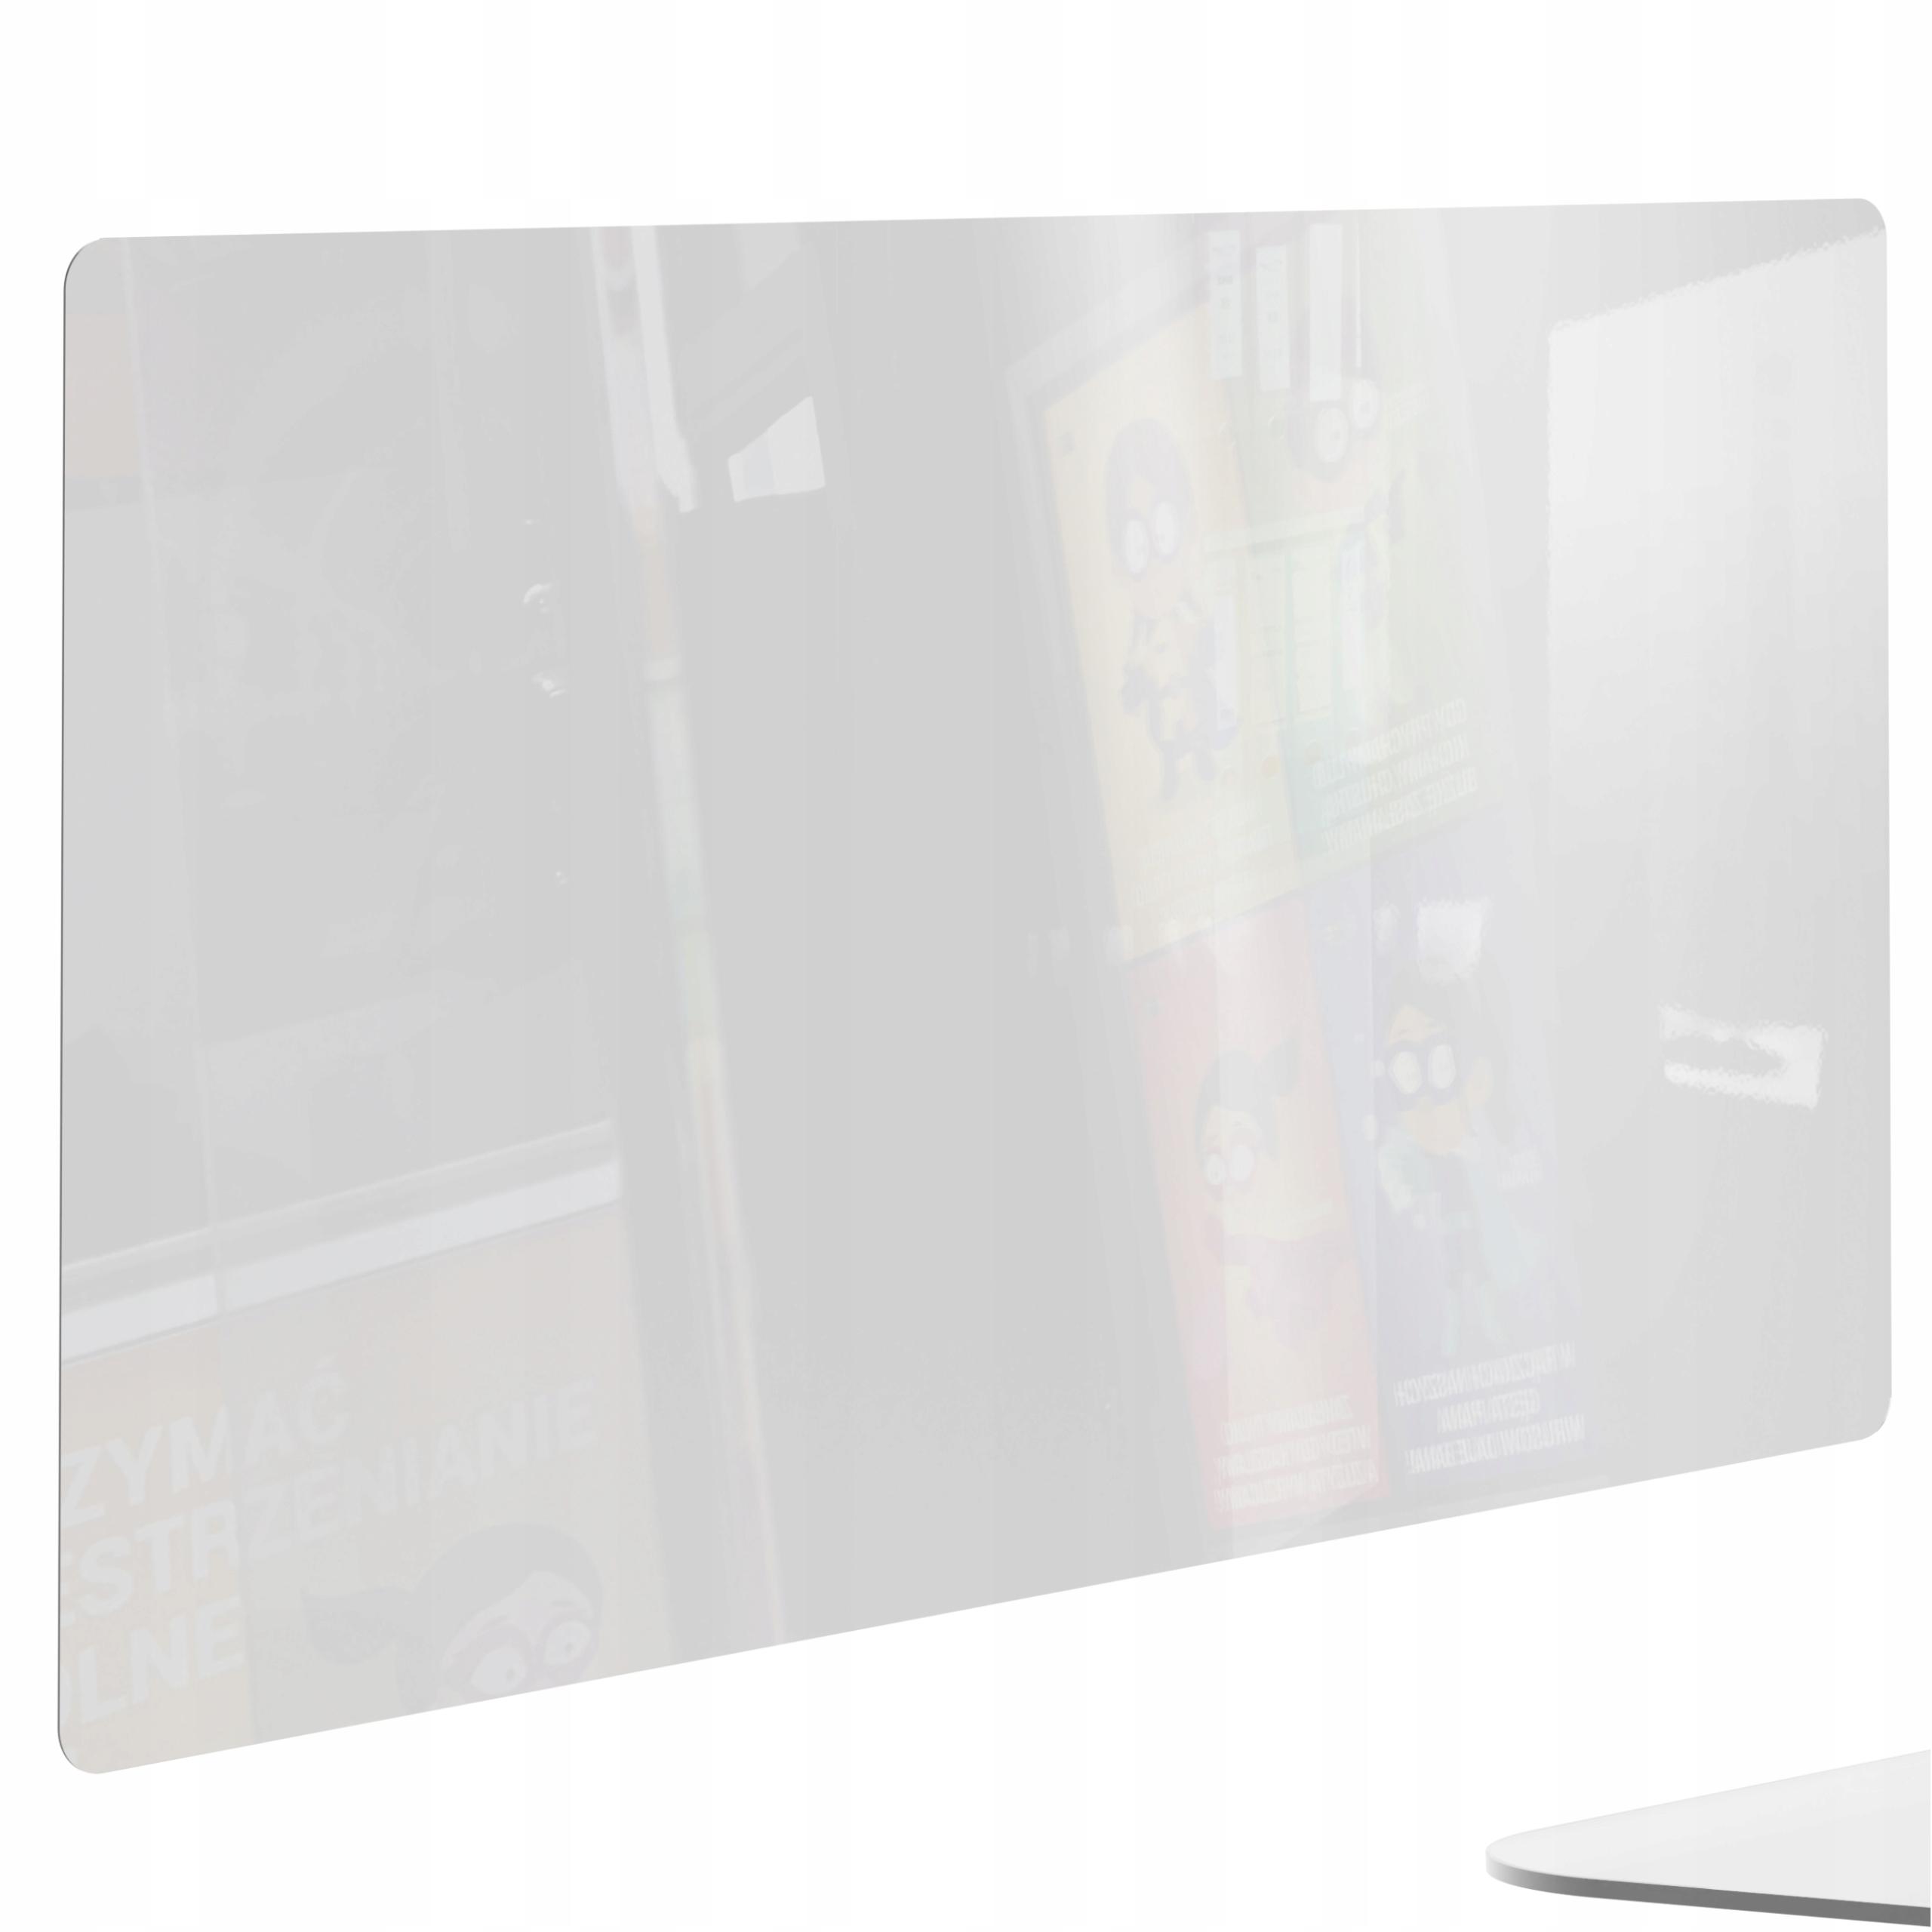 PLEXI бесцветная пластина из оргстекла 2мм 68x120см